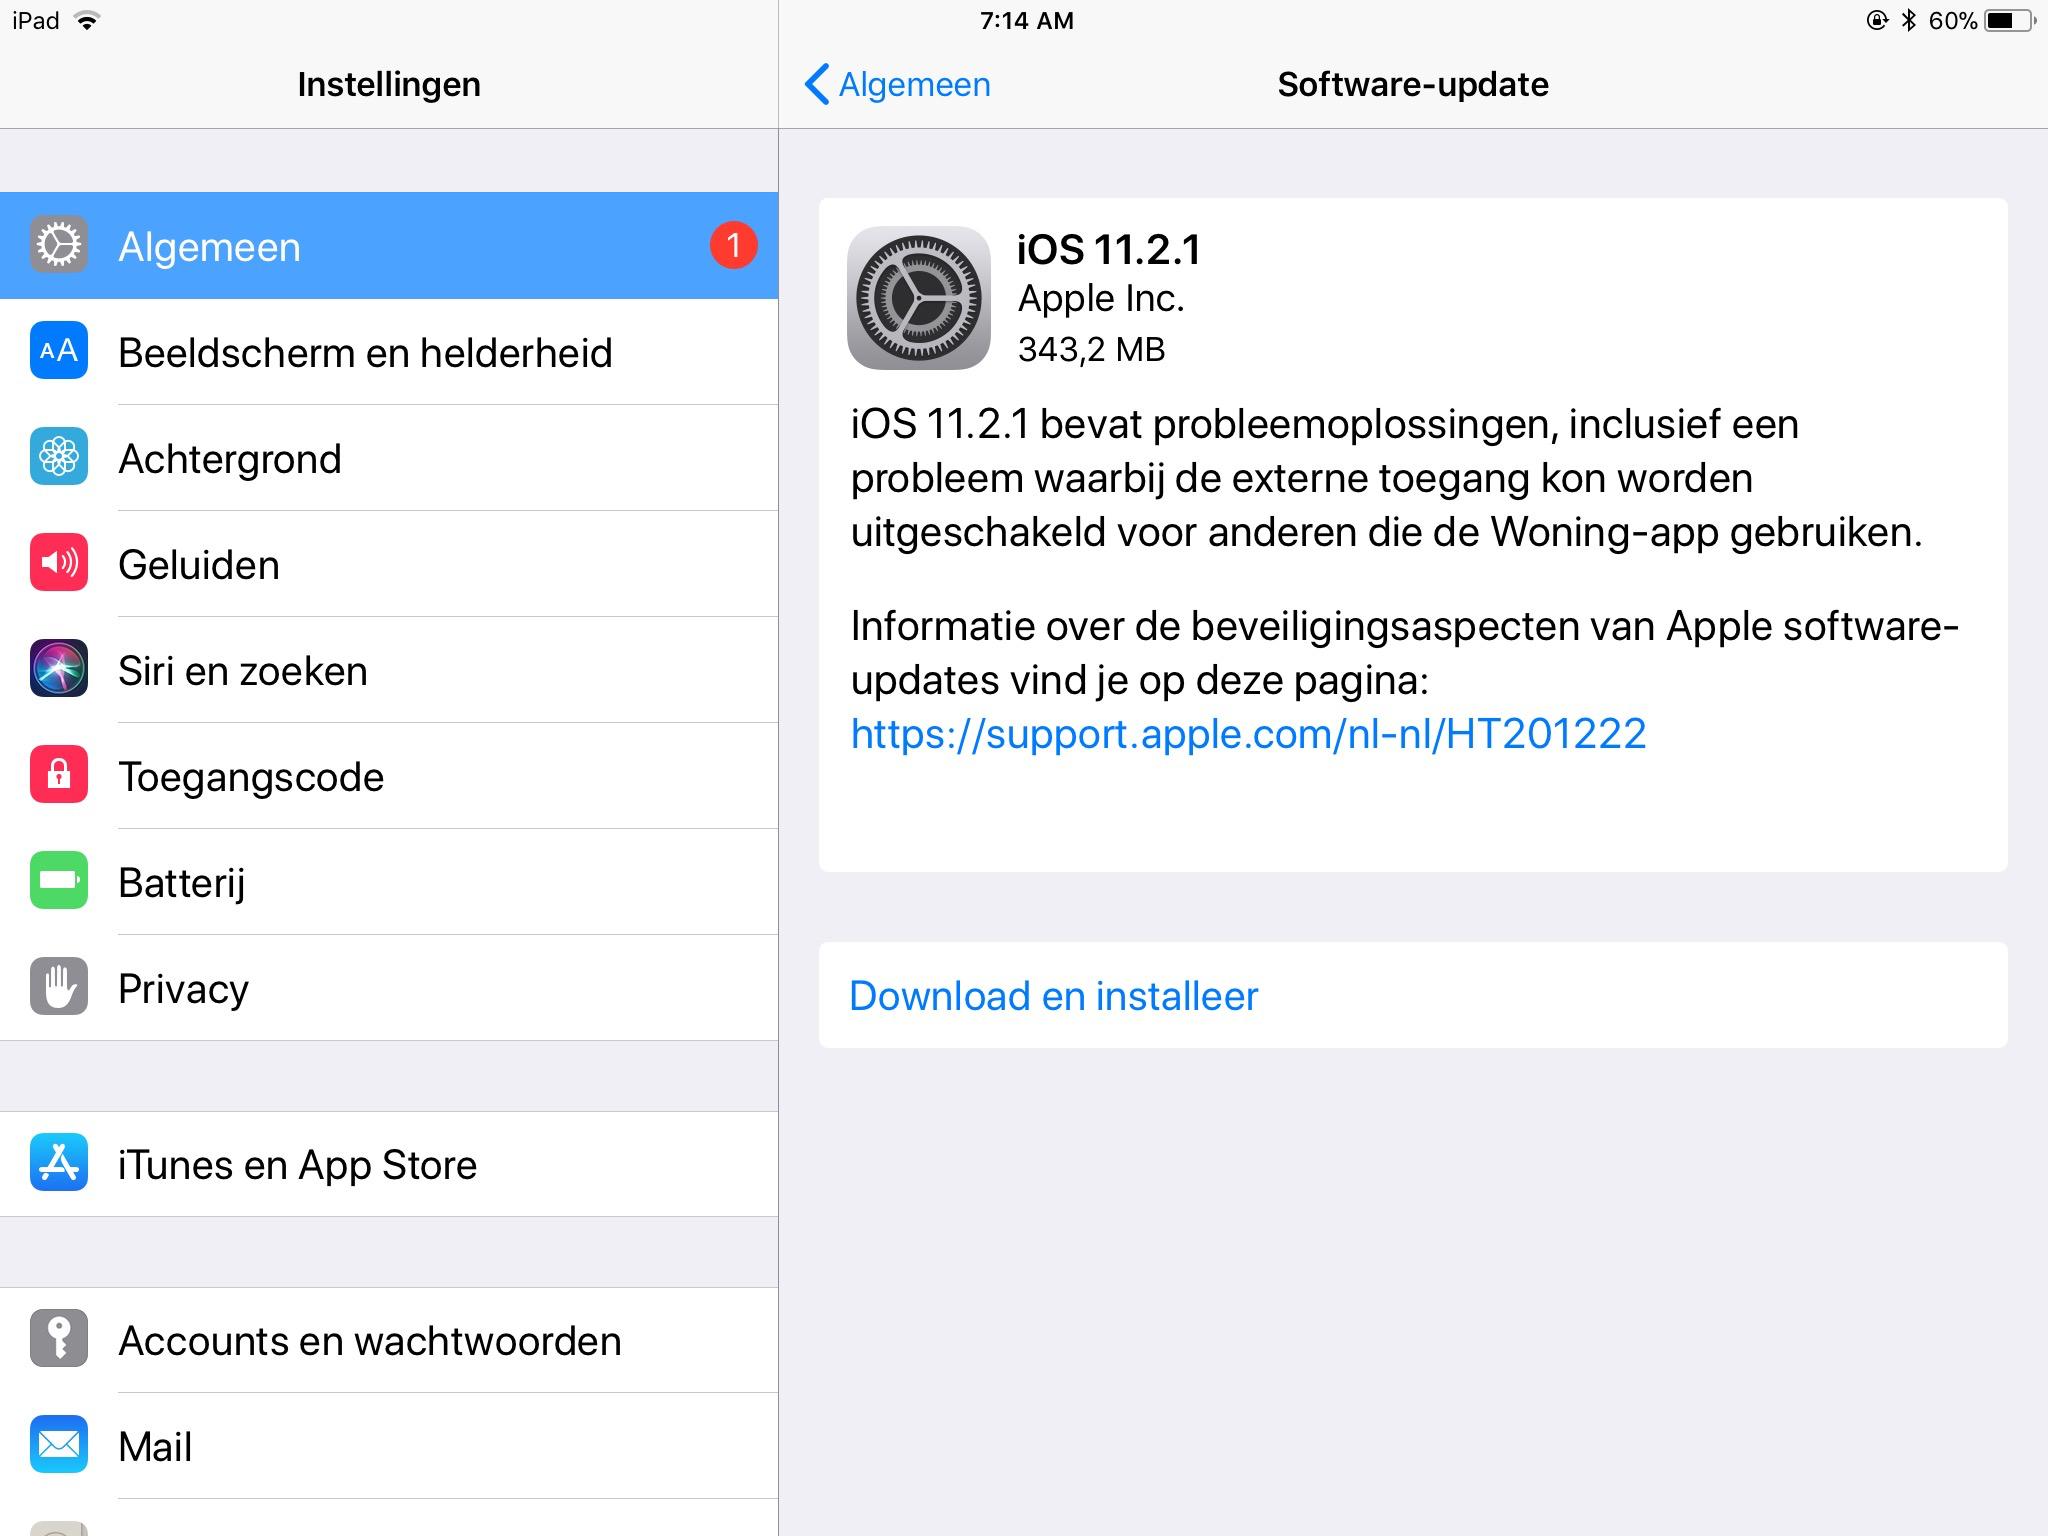 http://www.macfreak.nl/modules/news/images/zArt.iOS11.2.1-iPad.jpg